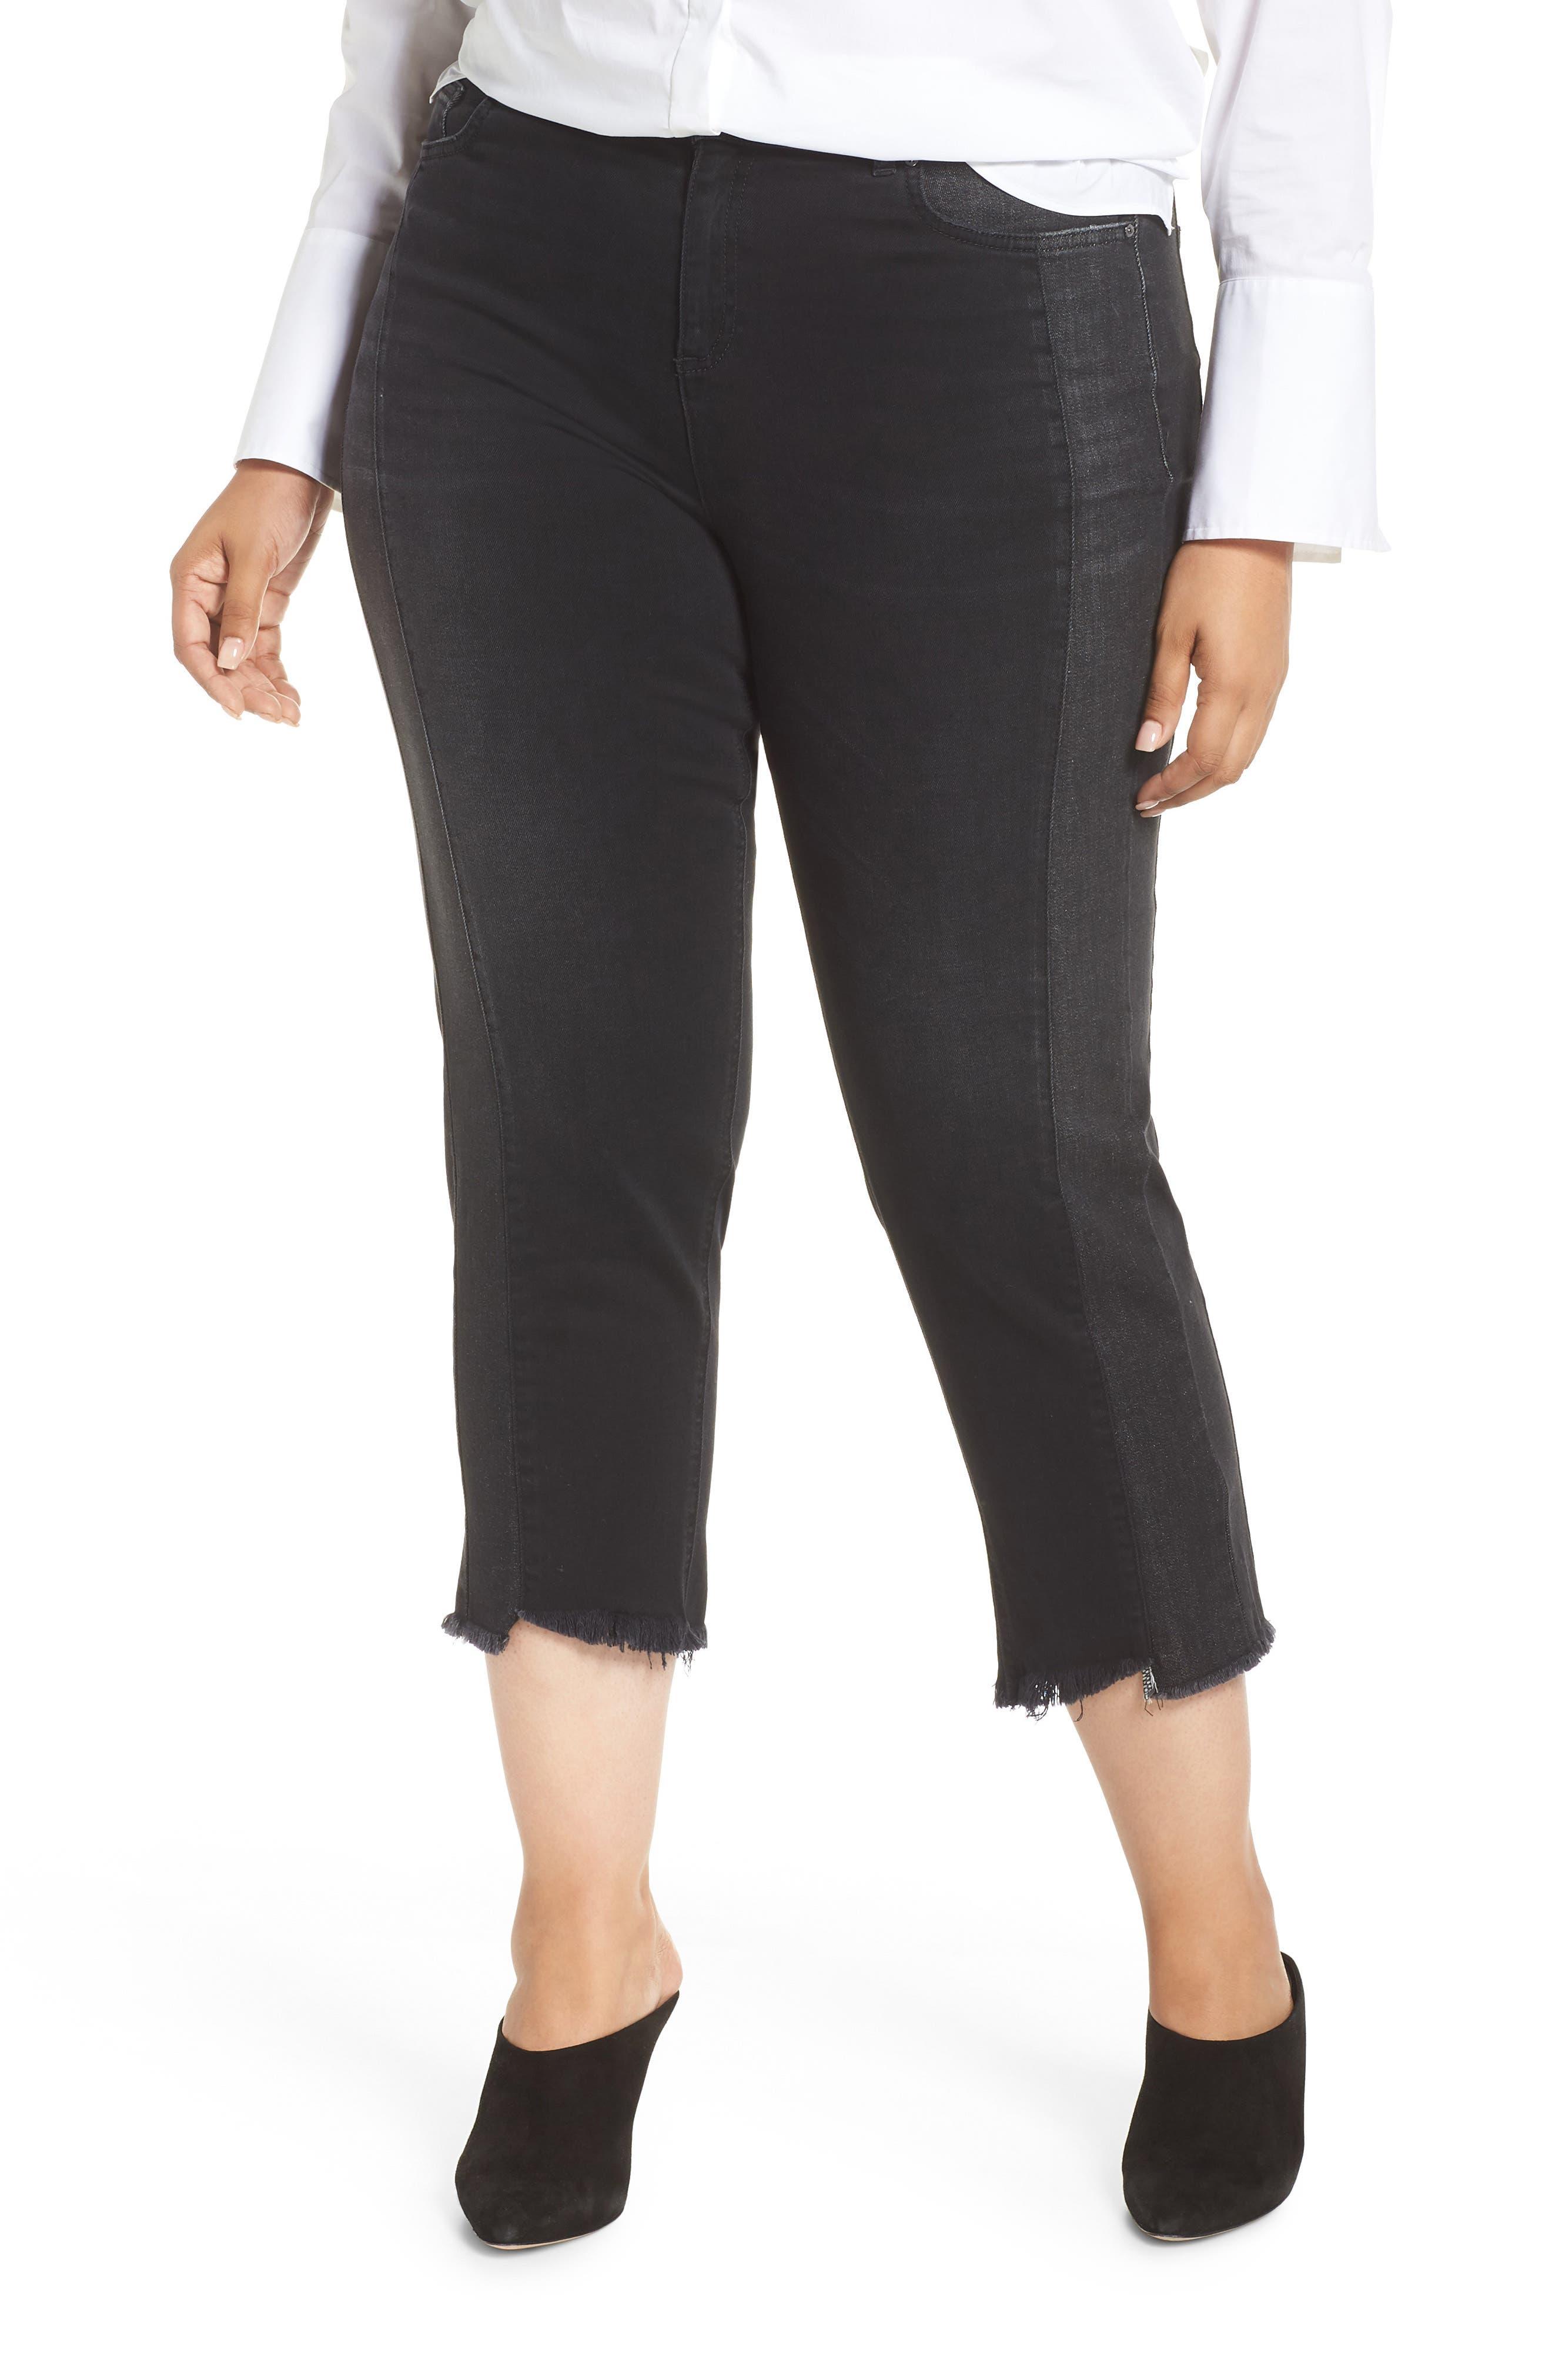 ASHLEY GRAHAM X MARINA RINALDI Idrovoro Step Hem Crop Jeans in Black 2